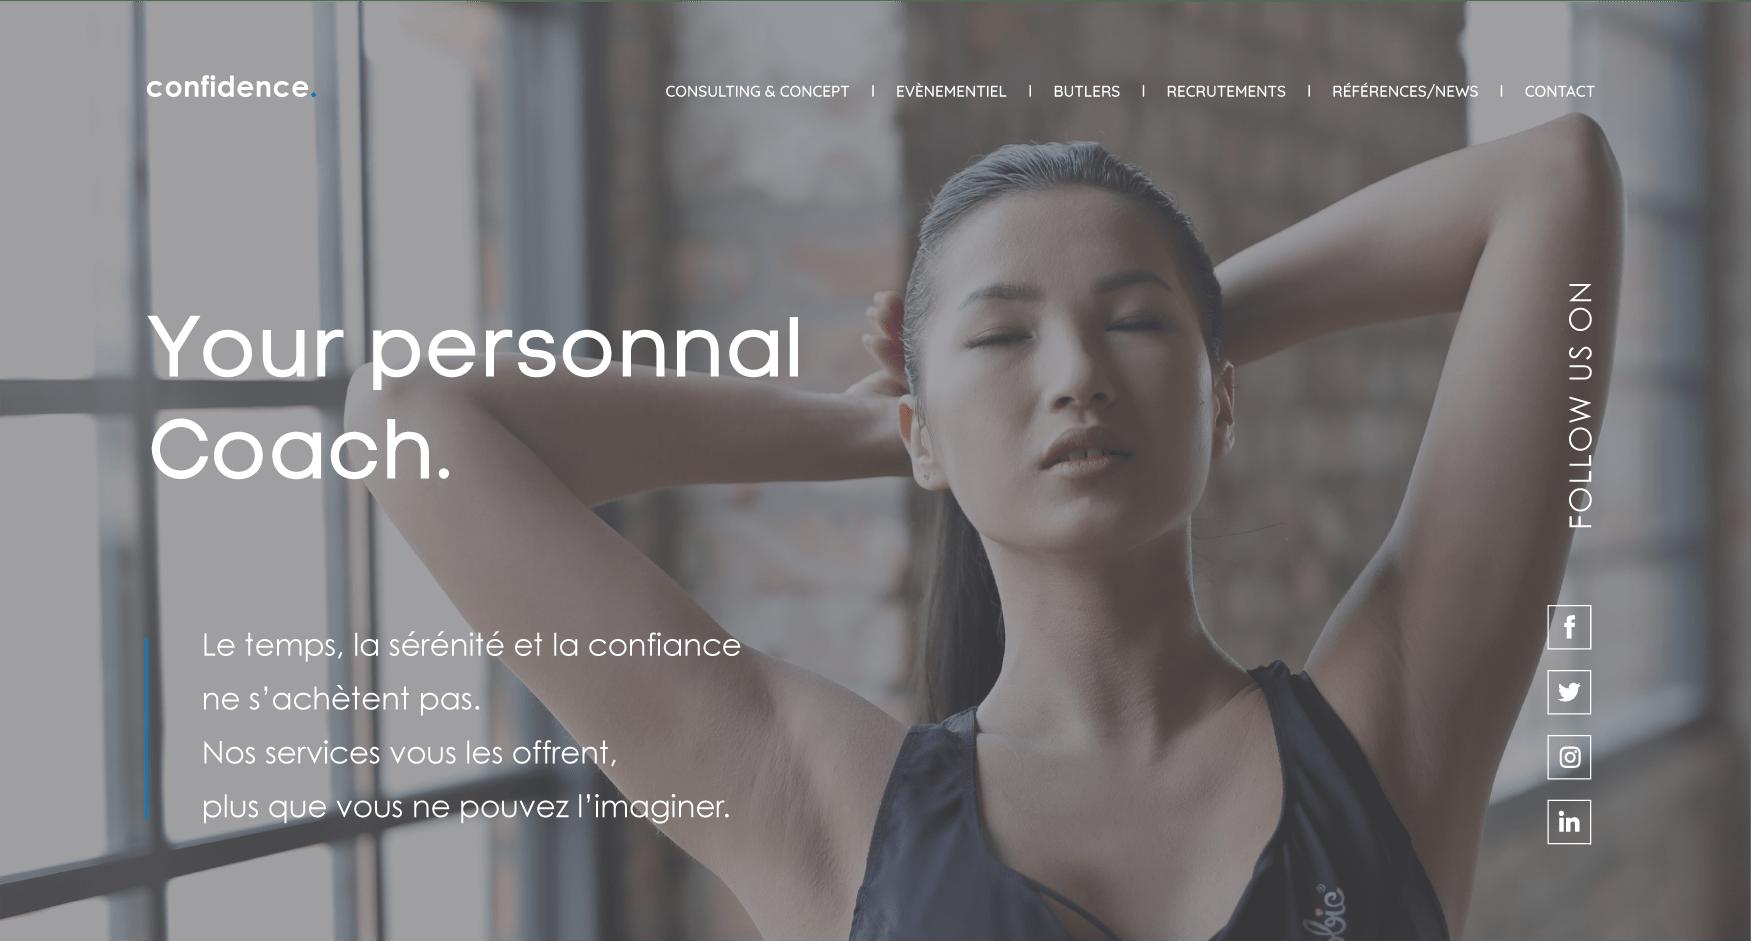 Projet de Cassian : Confidence